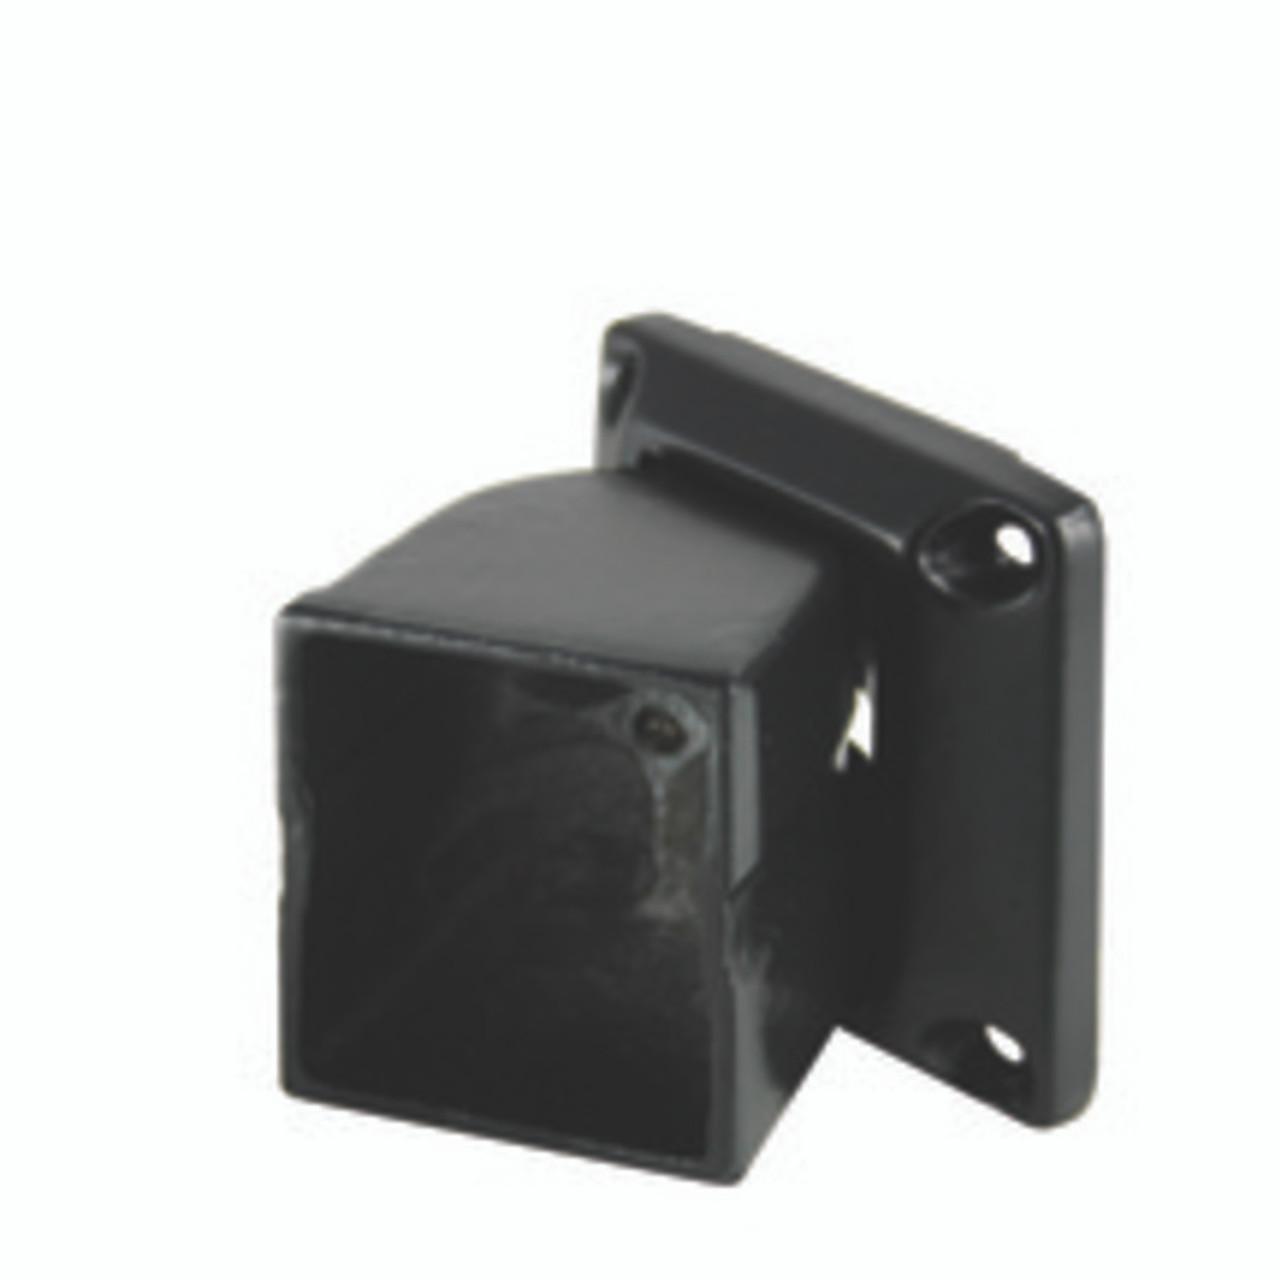 Key-Link Arabian Series Bottom Swivel Bracket - Black